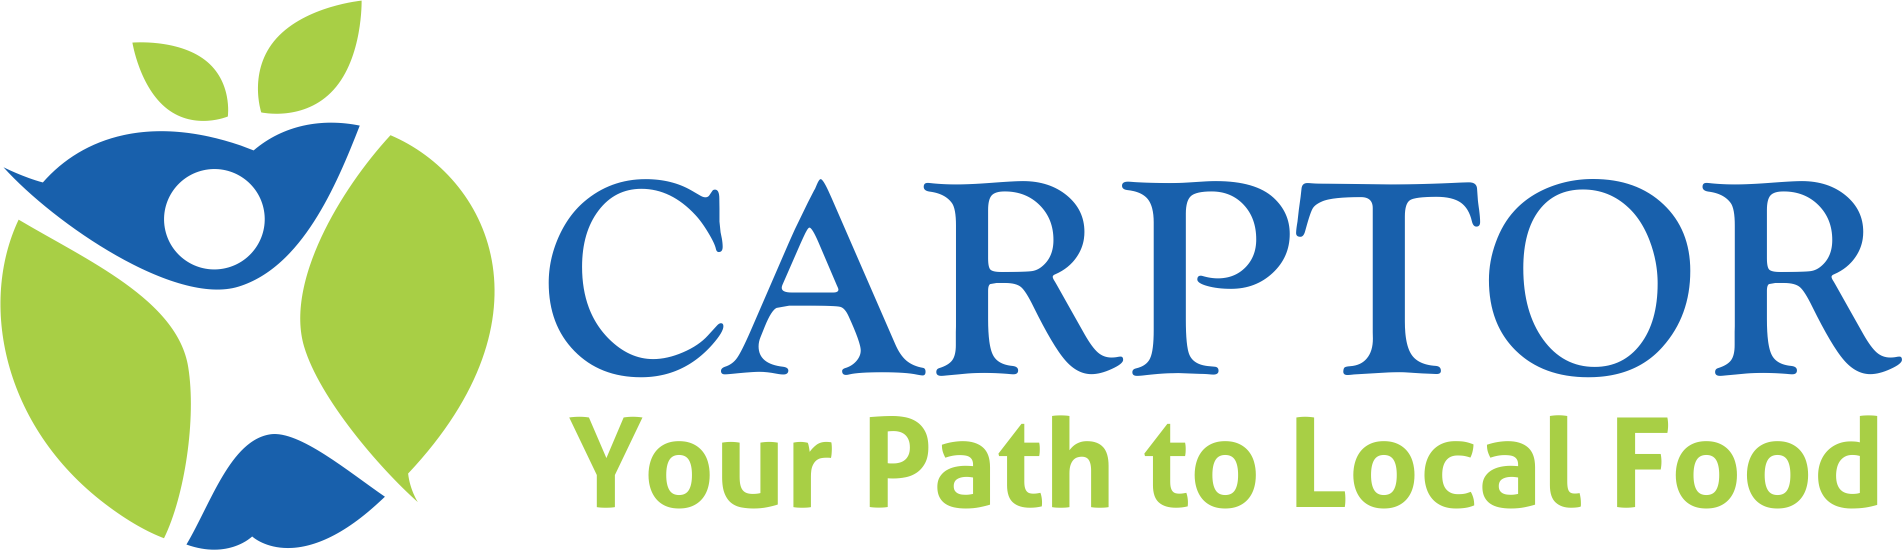 Carptor